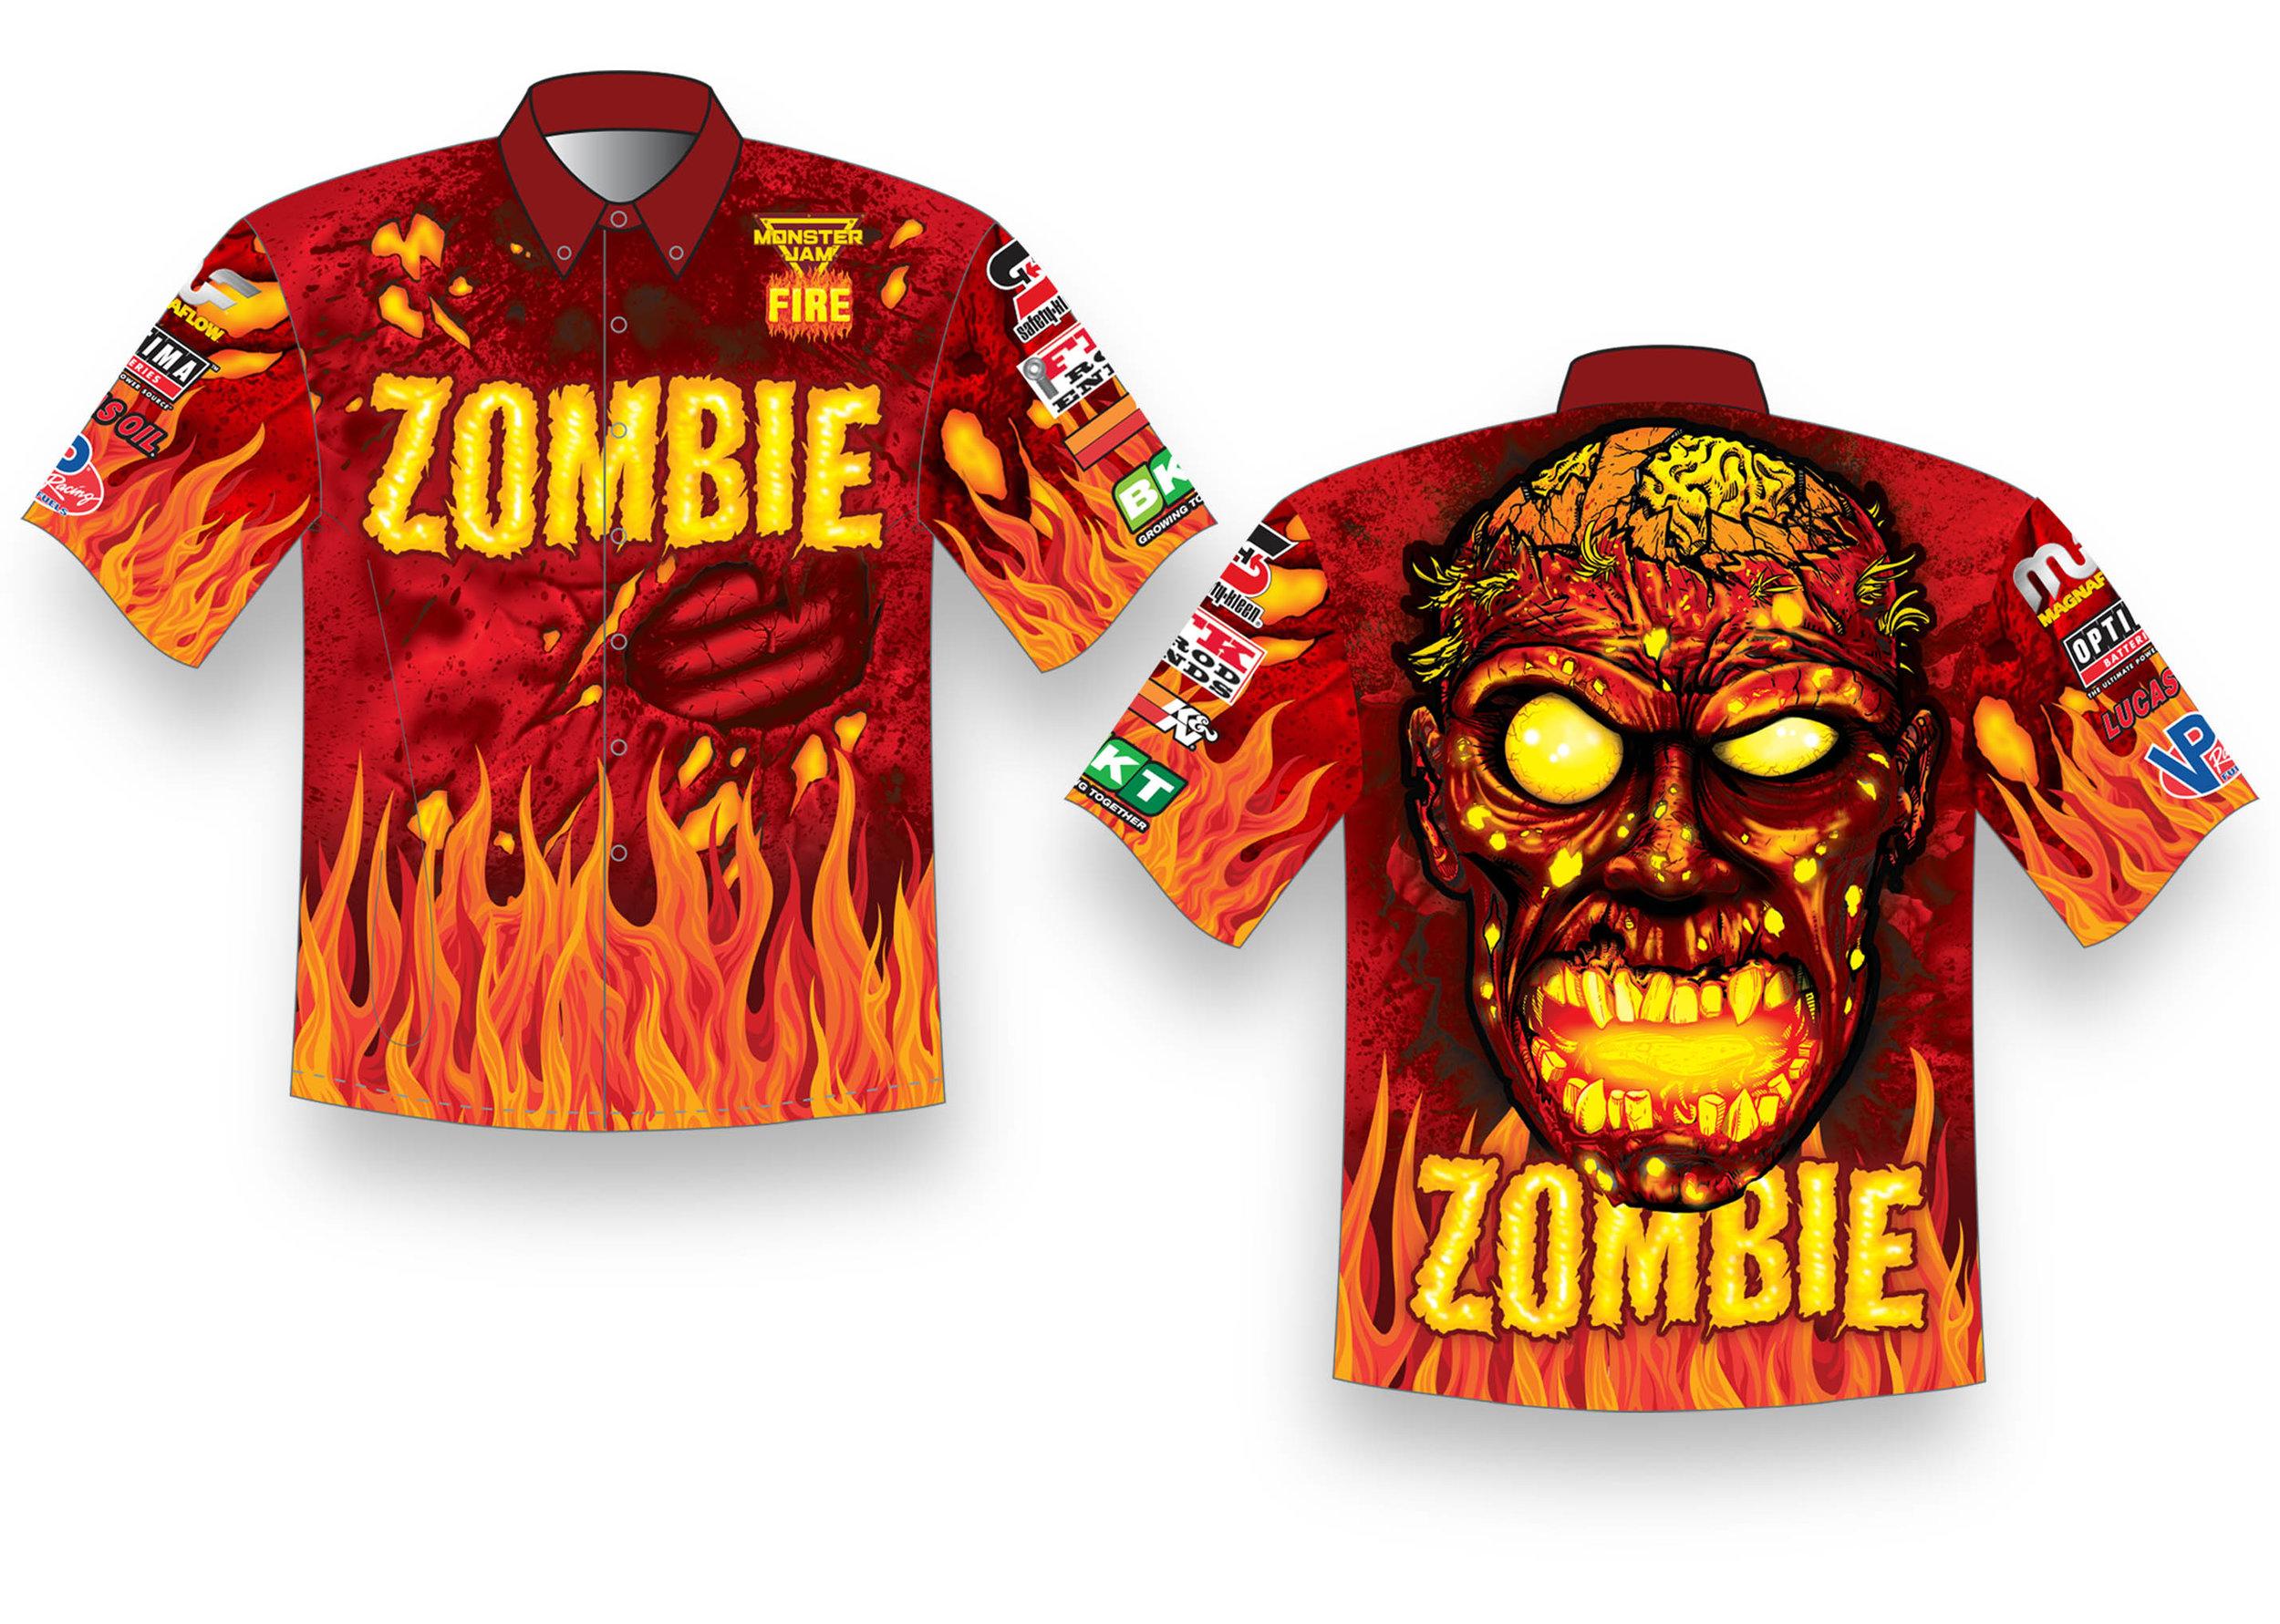 Crewshirt.Fire.Zombie.Horiz.jpg